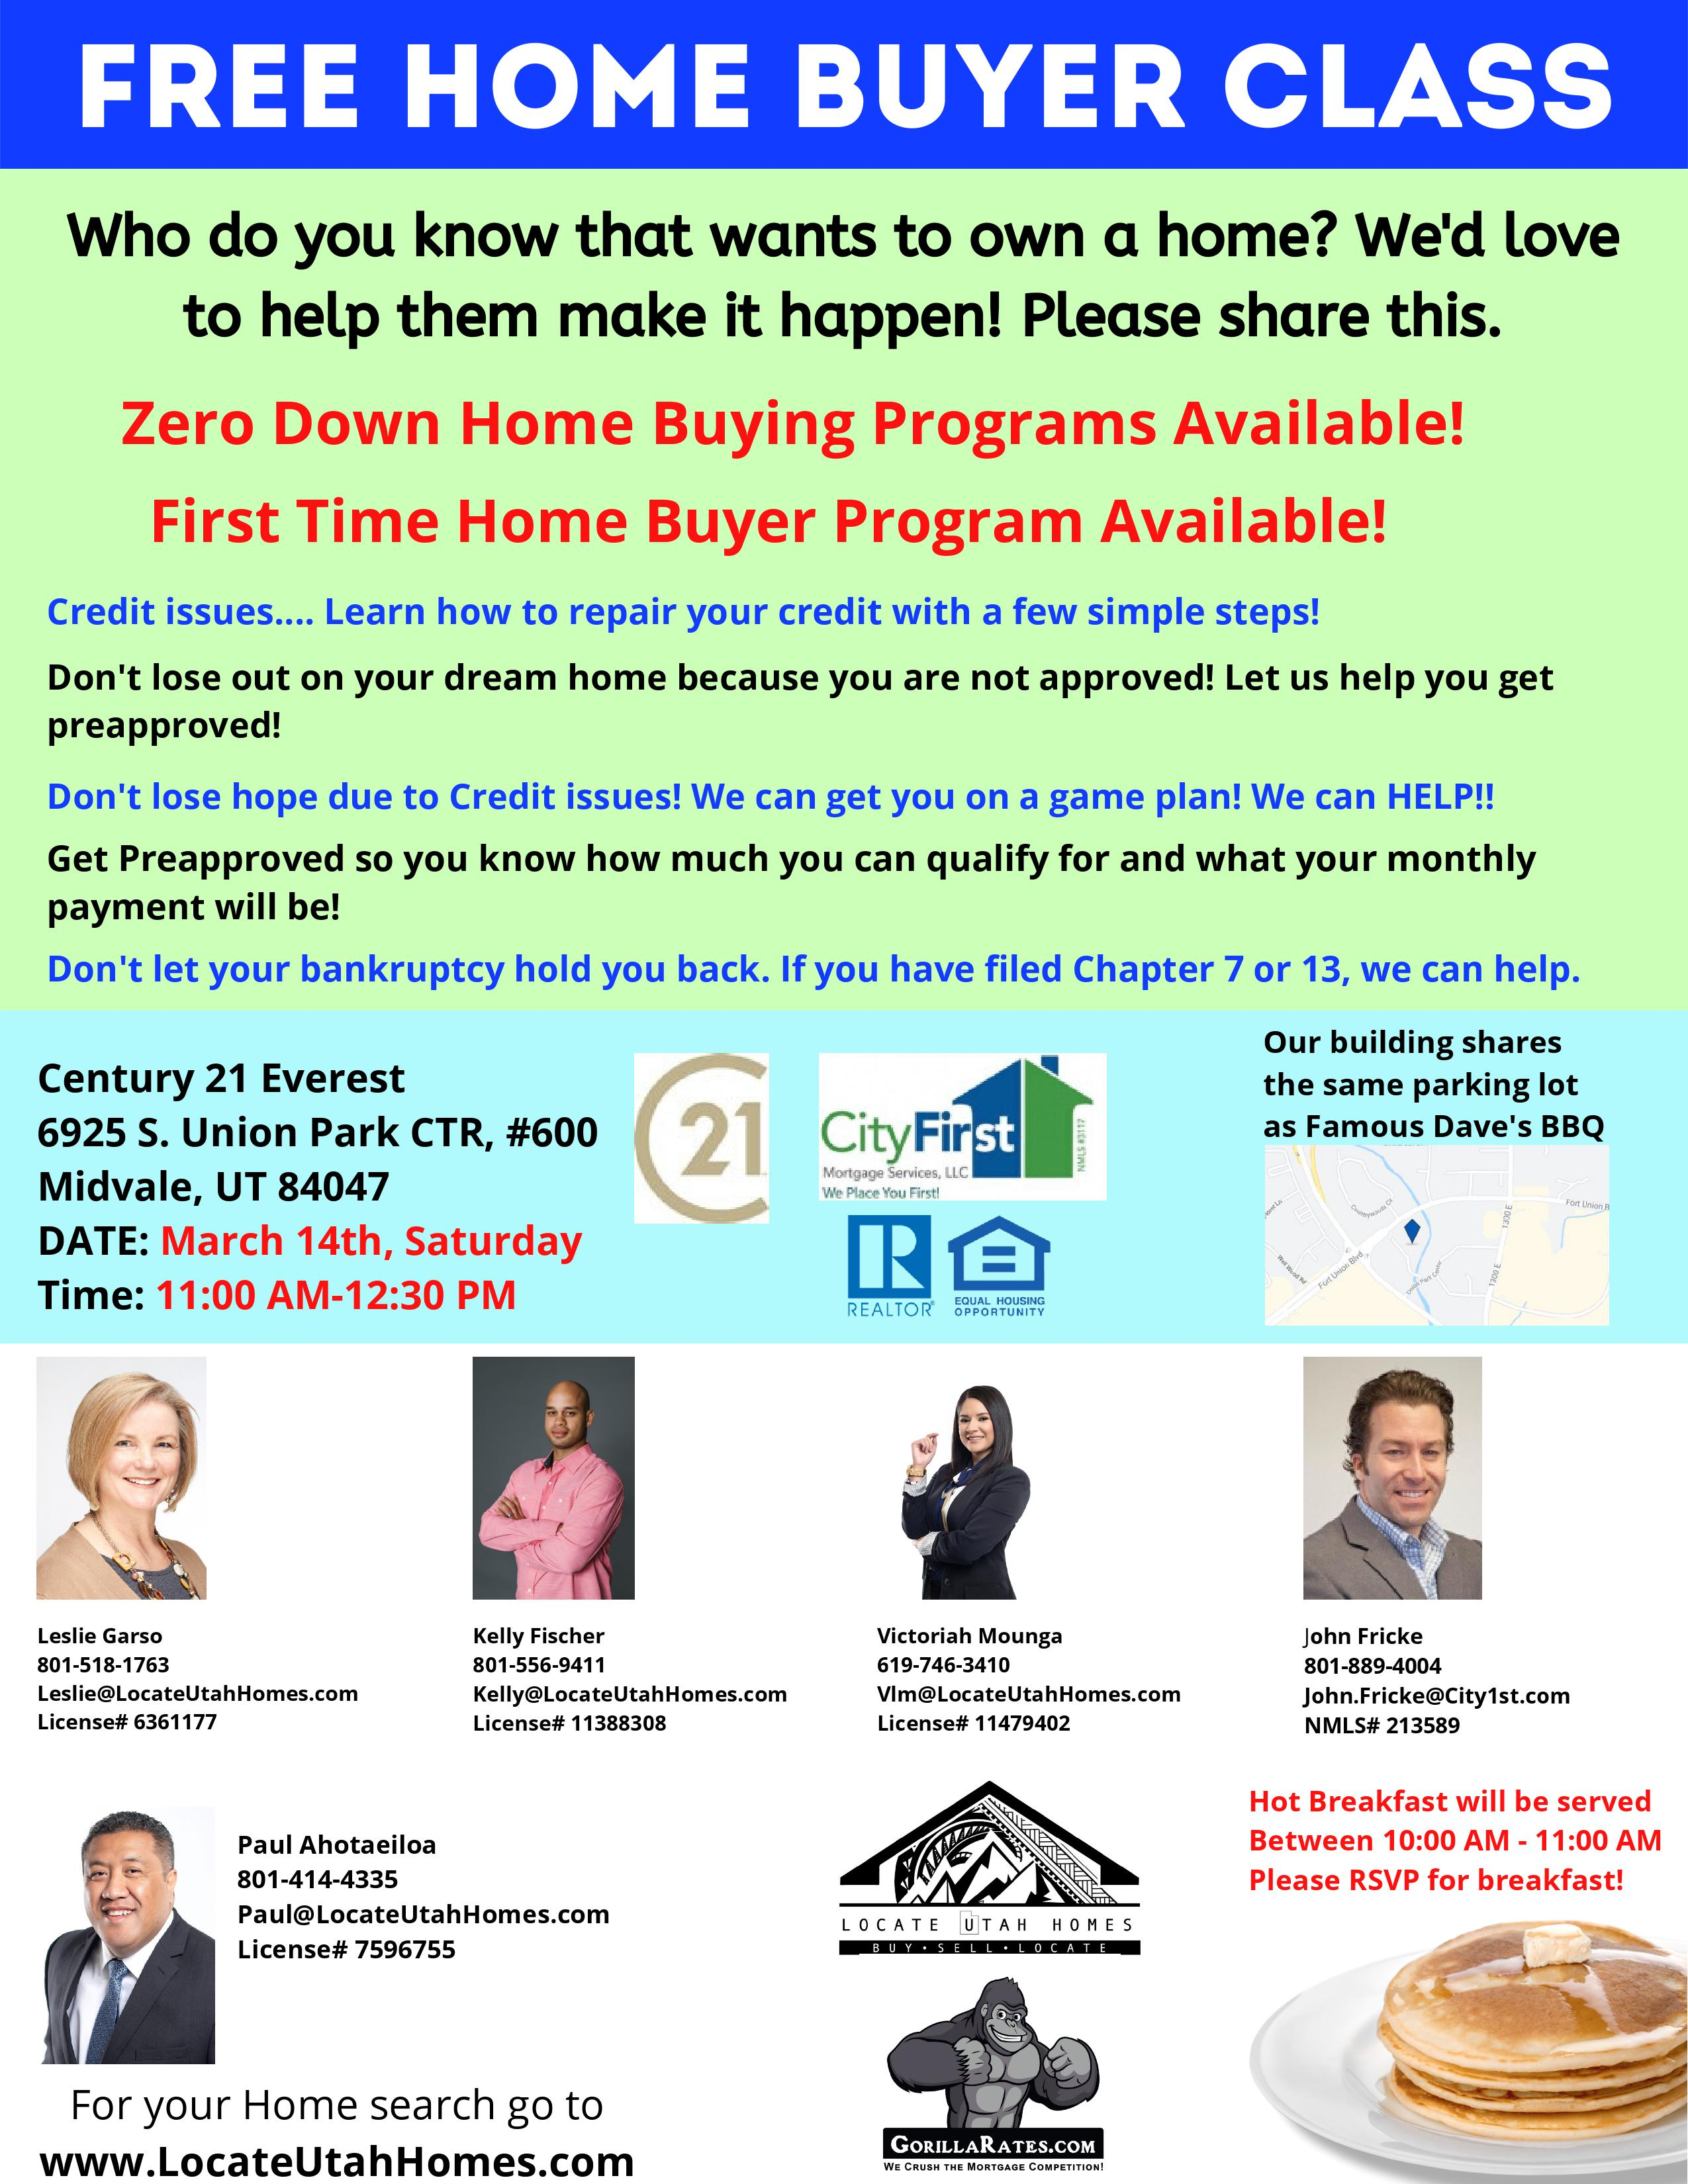 Home Buyer Seminar Flyer